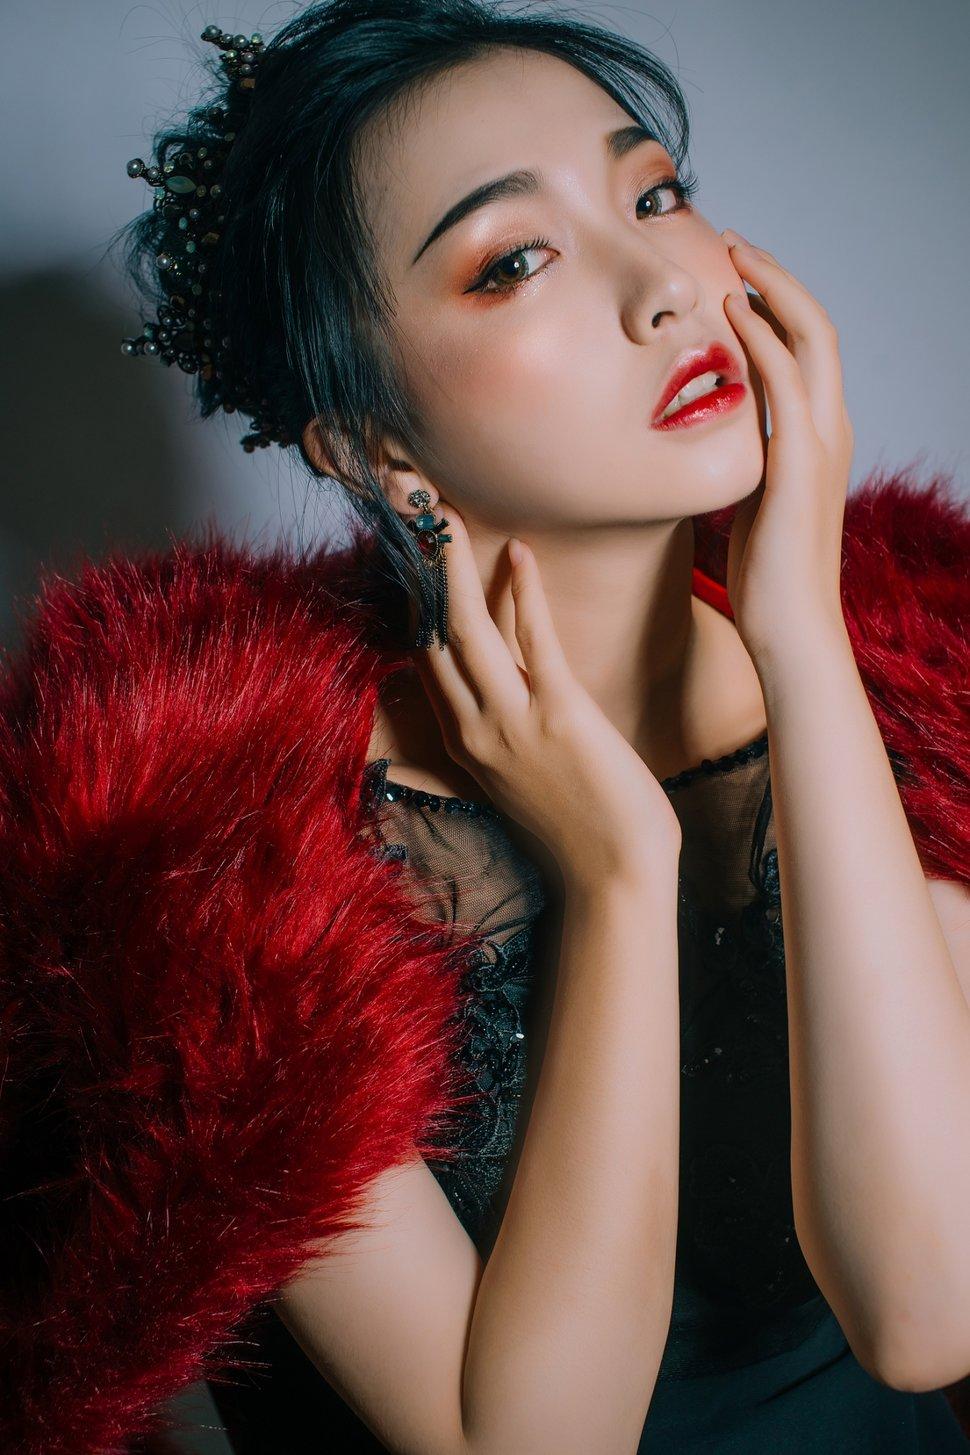 20180801_181121_0012 - Zona時尚美甲x新娘秘書整體造型工作室《結婚吧》